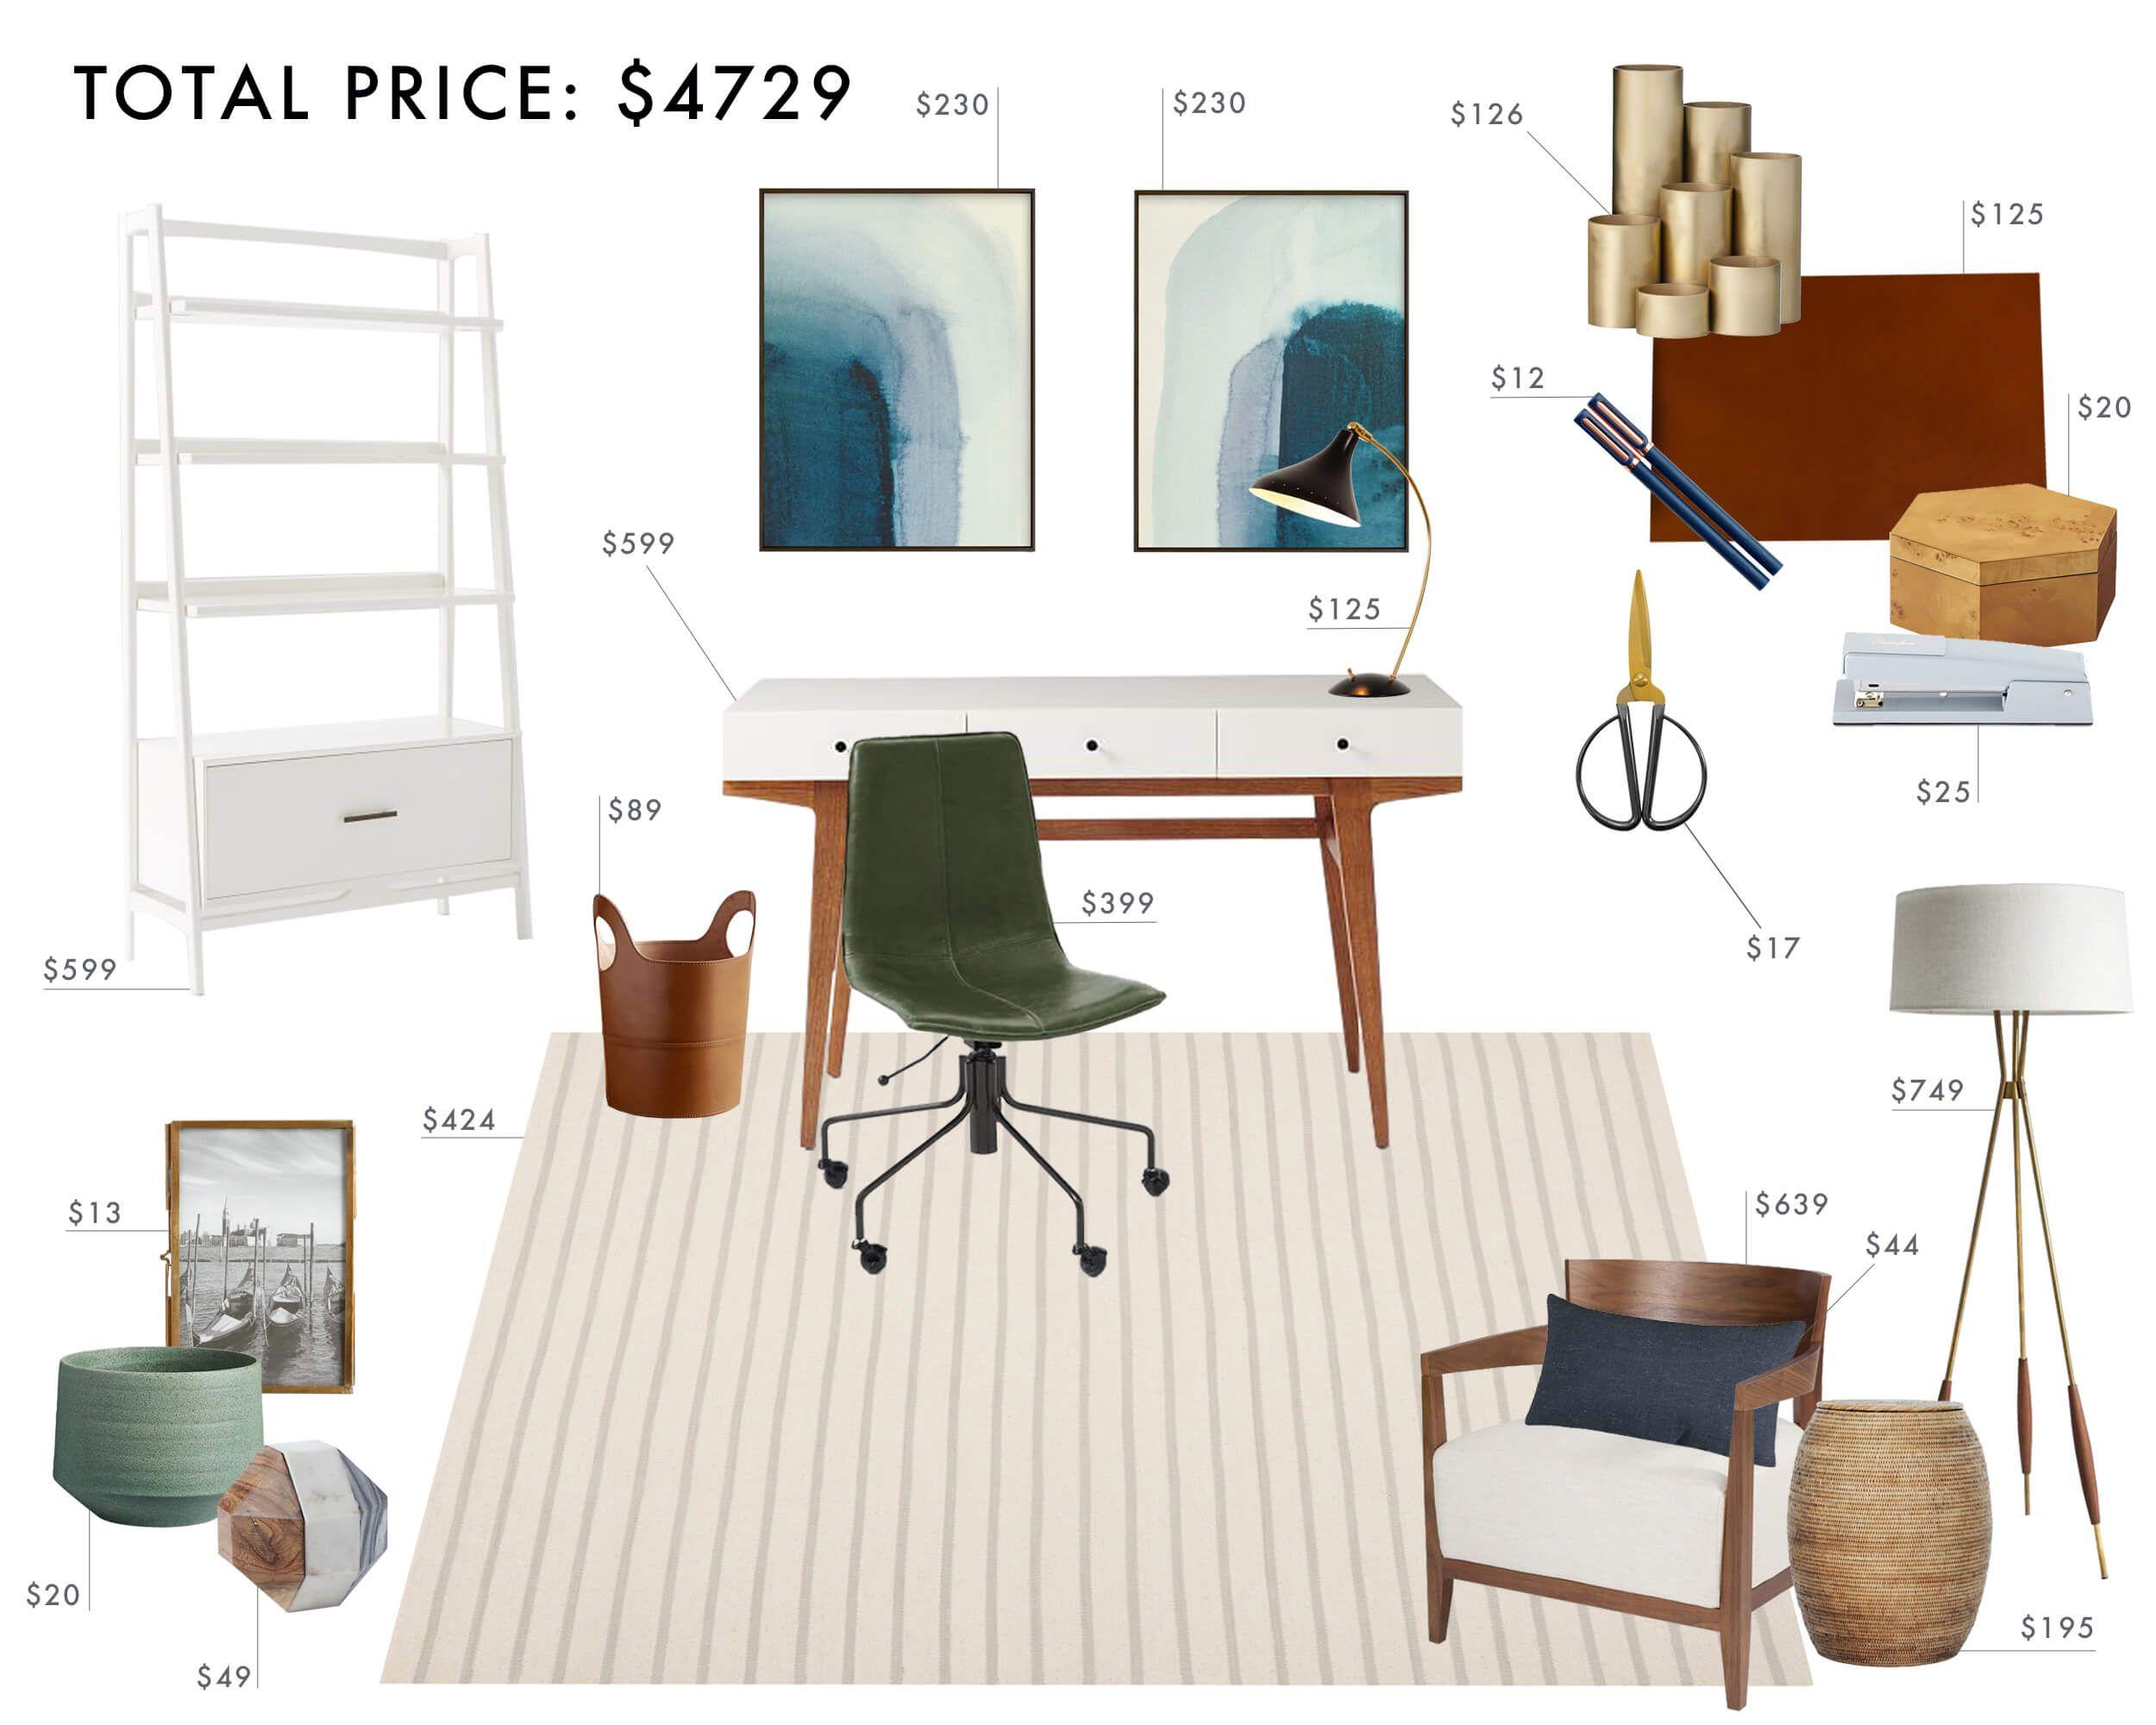 Budget Room Design: Neutral Home Office Under 5k - Emily Henderson ...